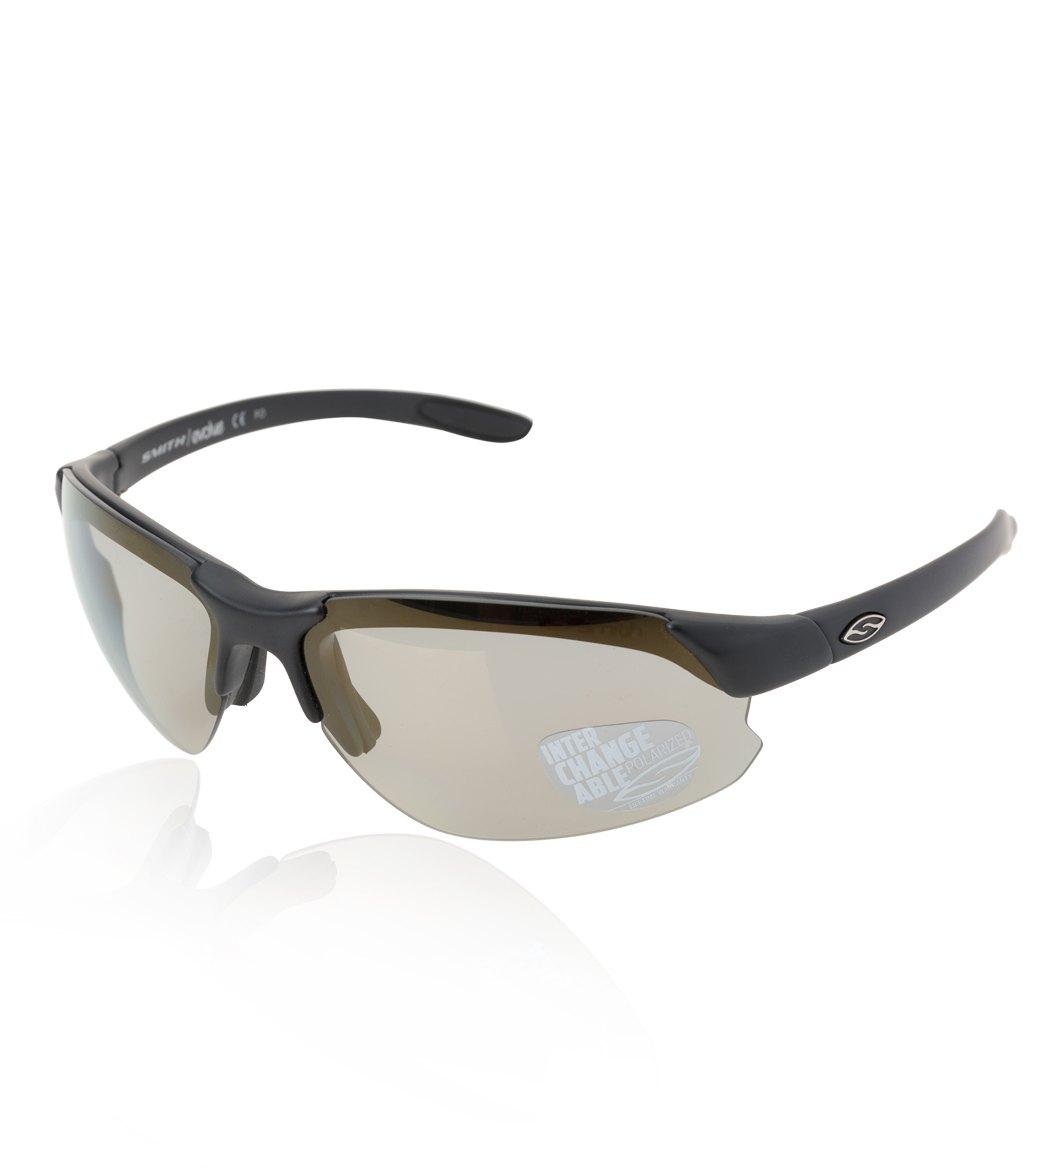 ed205d92d1 Smith Optics Men s Parallel D Max Sunglasses at SwimOutlet.com - Free  Shipping